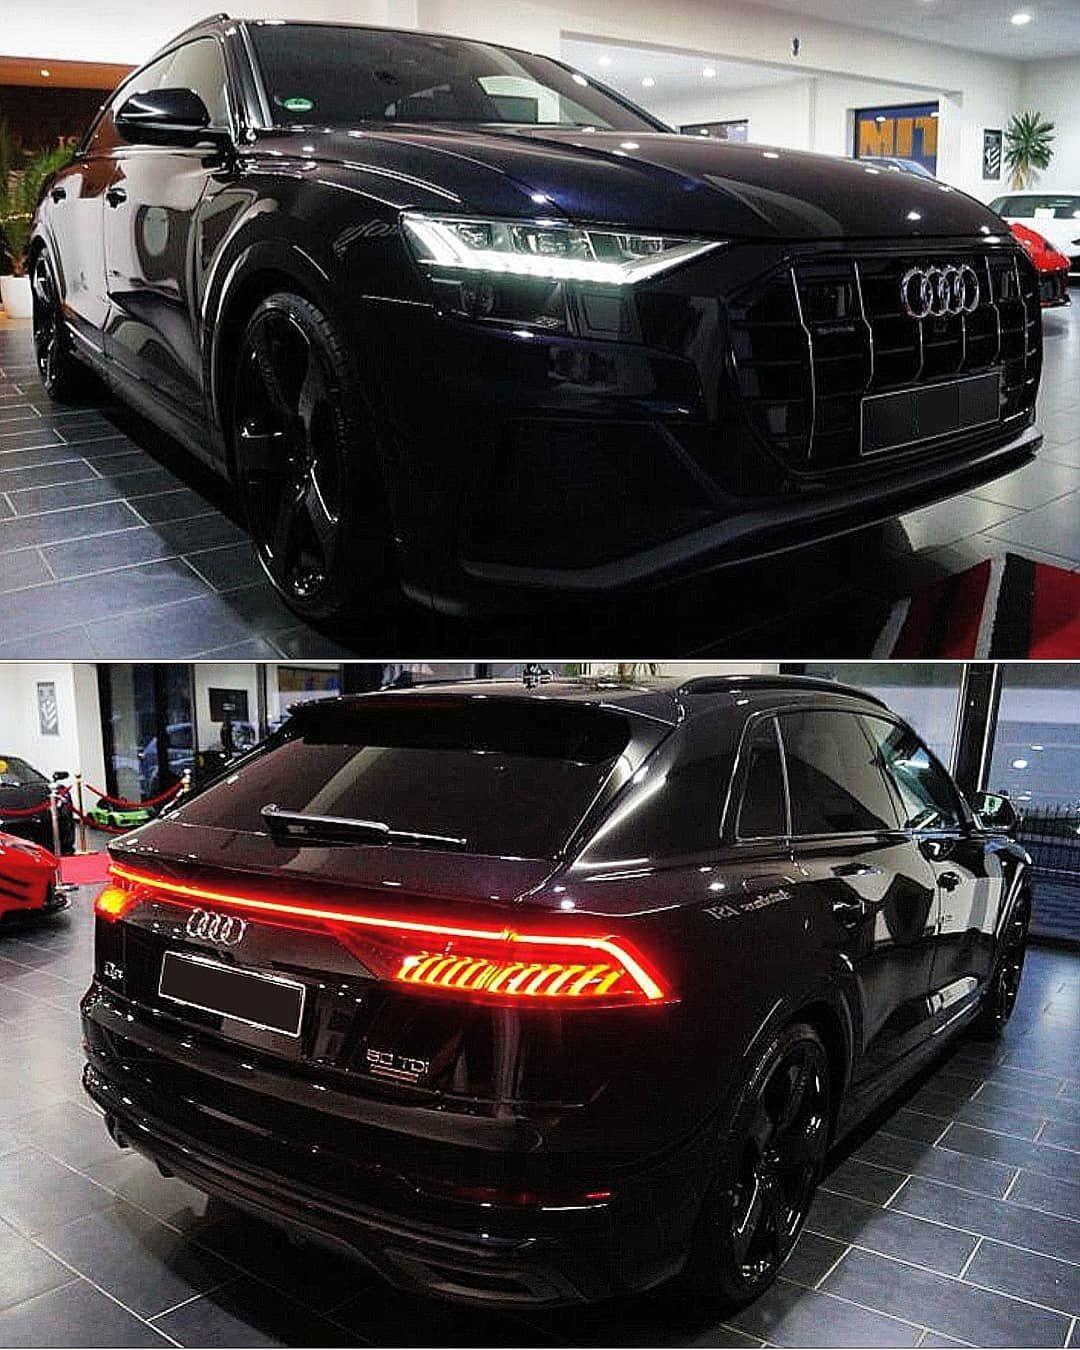 Battleship Q8 Audi Lovers Q8 Nation Audi Audiq8 Audilove Carlove Suv Audiq7 Turb Audi Cars Audi Bmw Car